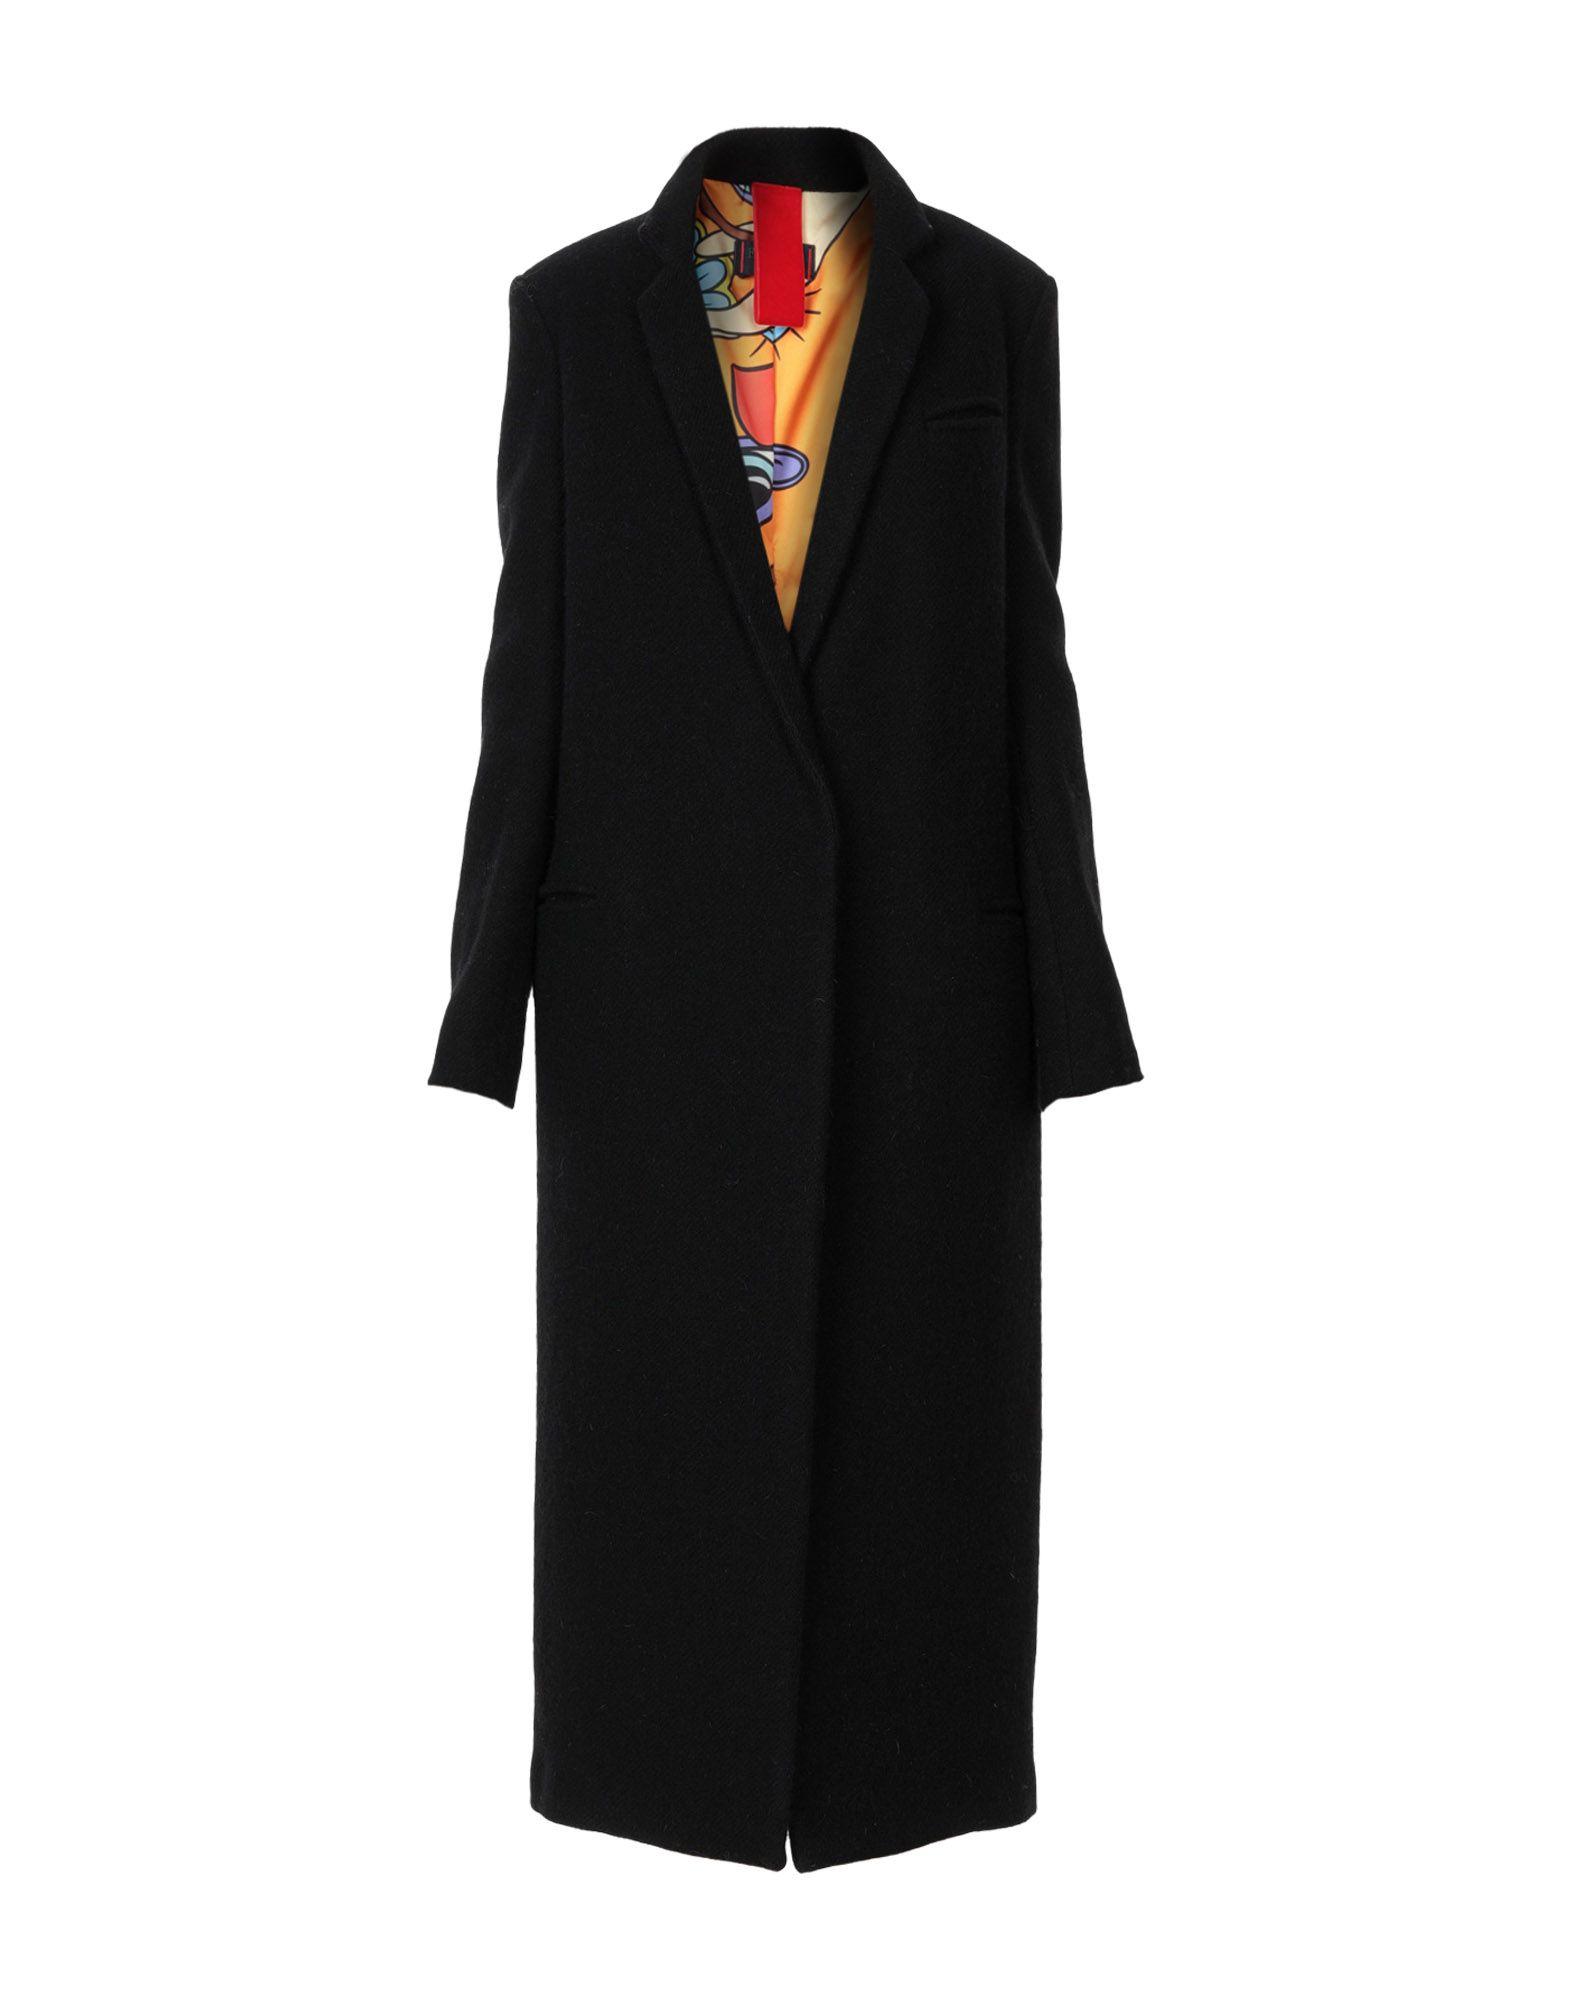 FEMME BY MICHELE ROSSI Coat in Black